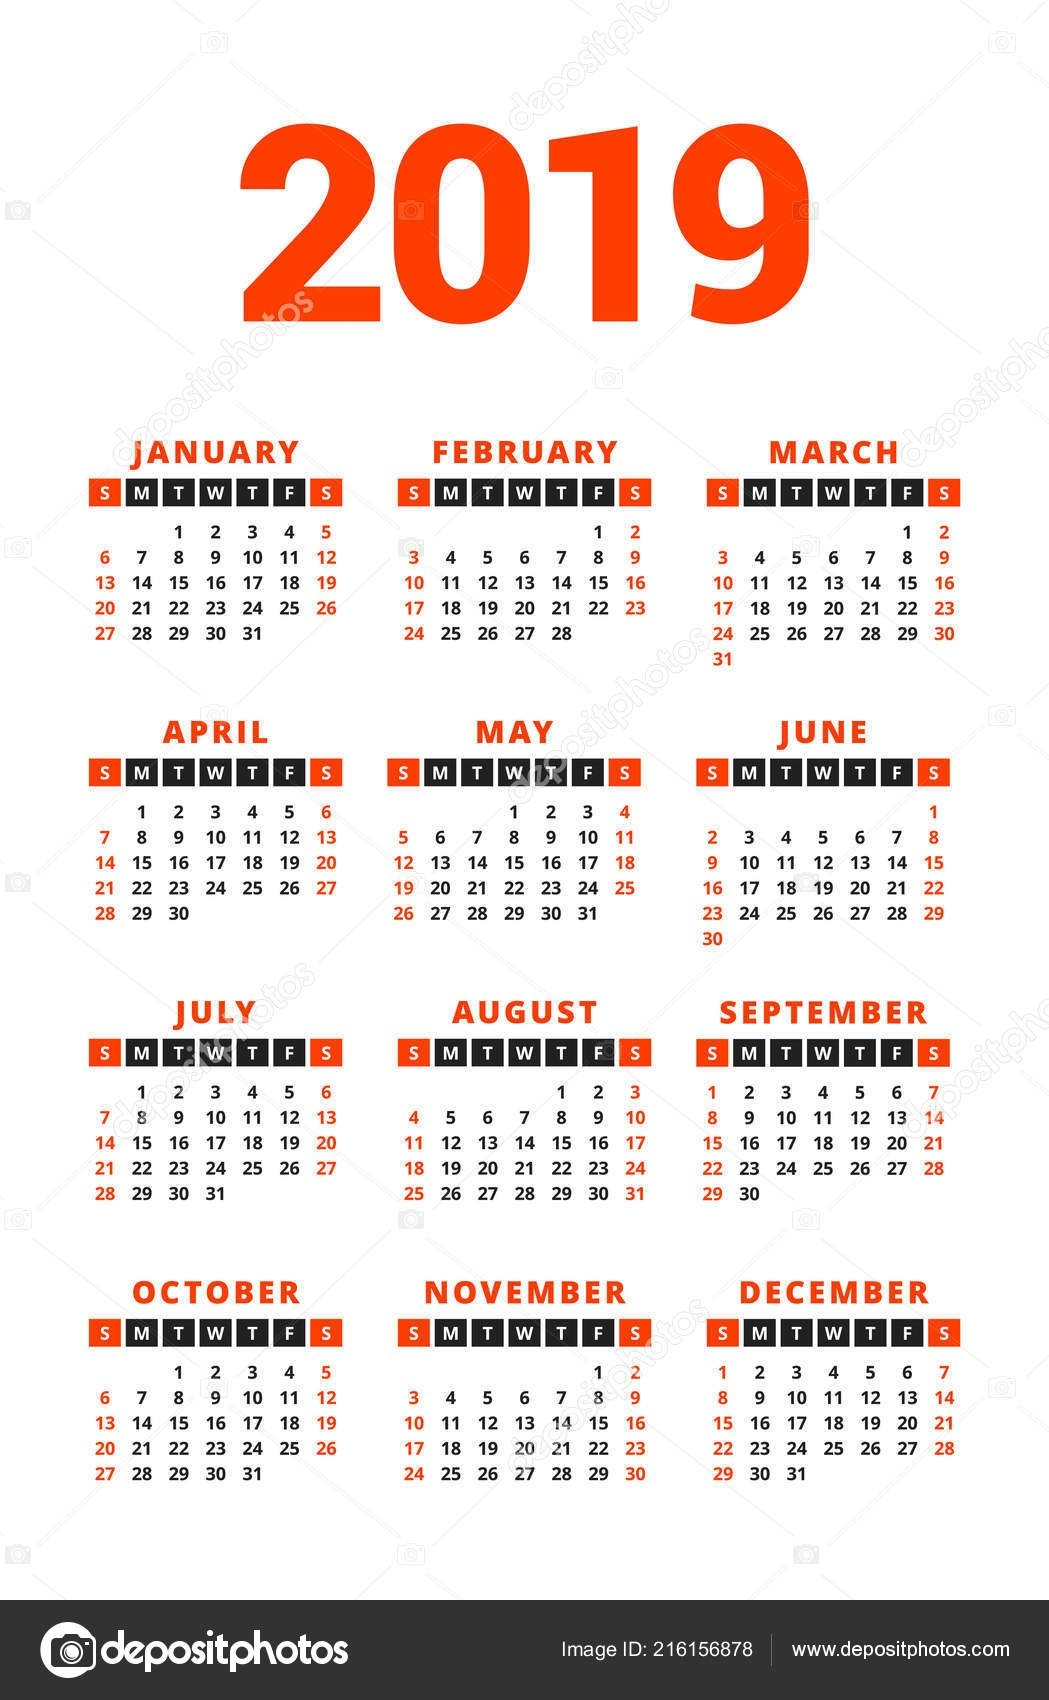 Calendar 2019 Year White Background Week Starts Sunday Columns Rows 2 Column Calendar 2019